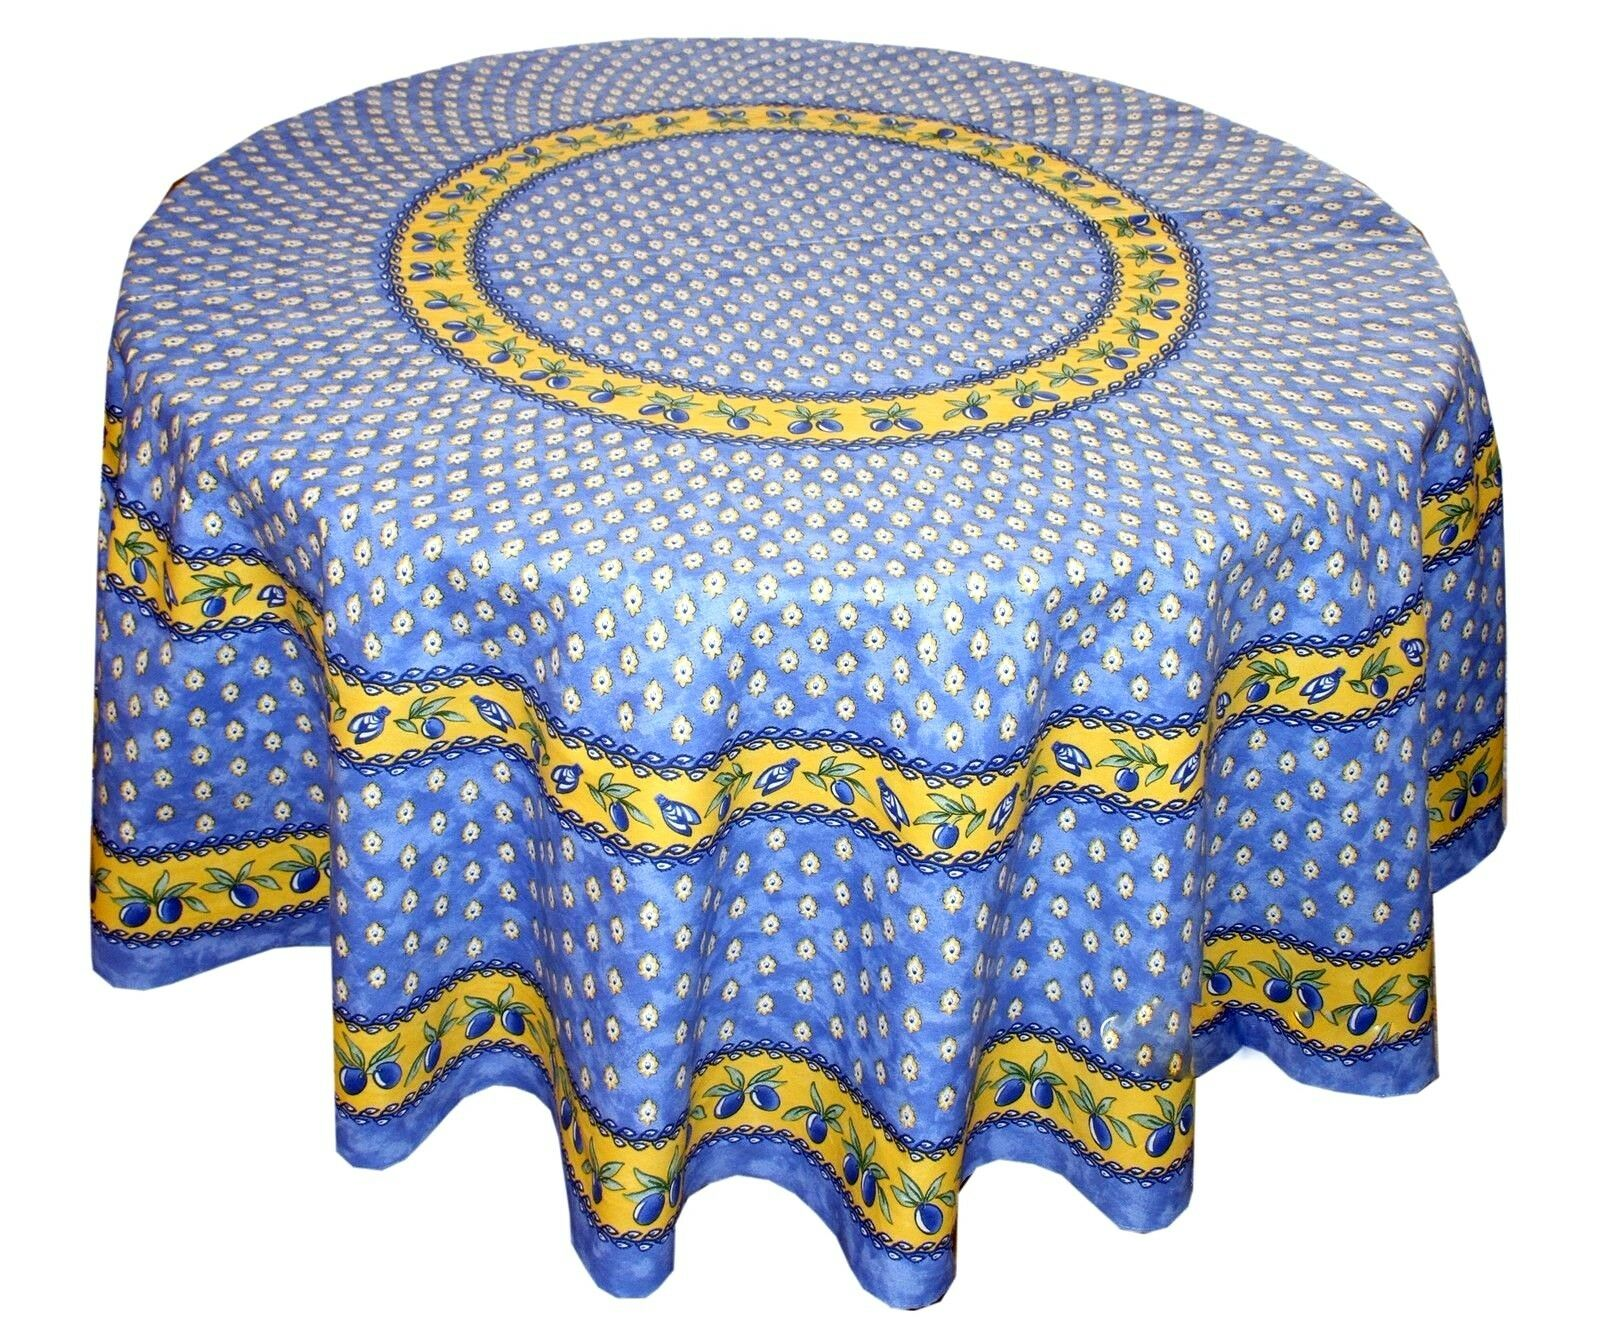 LE CLUNY, MONACO bleu French Provence enduit Coton Nappe, 70  rond, NEUF